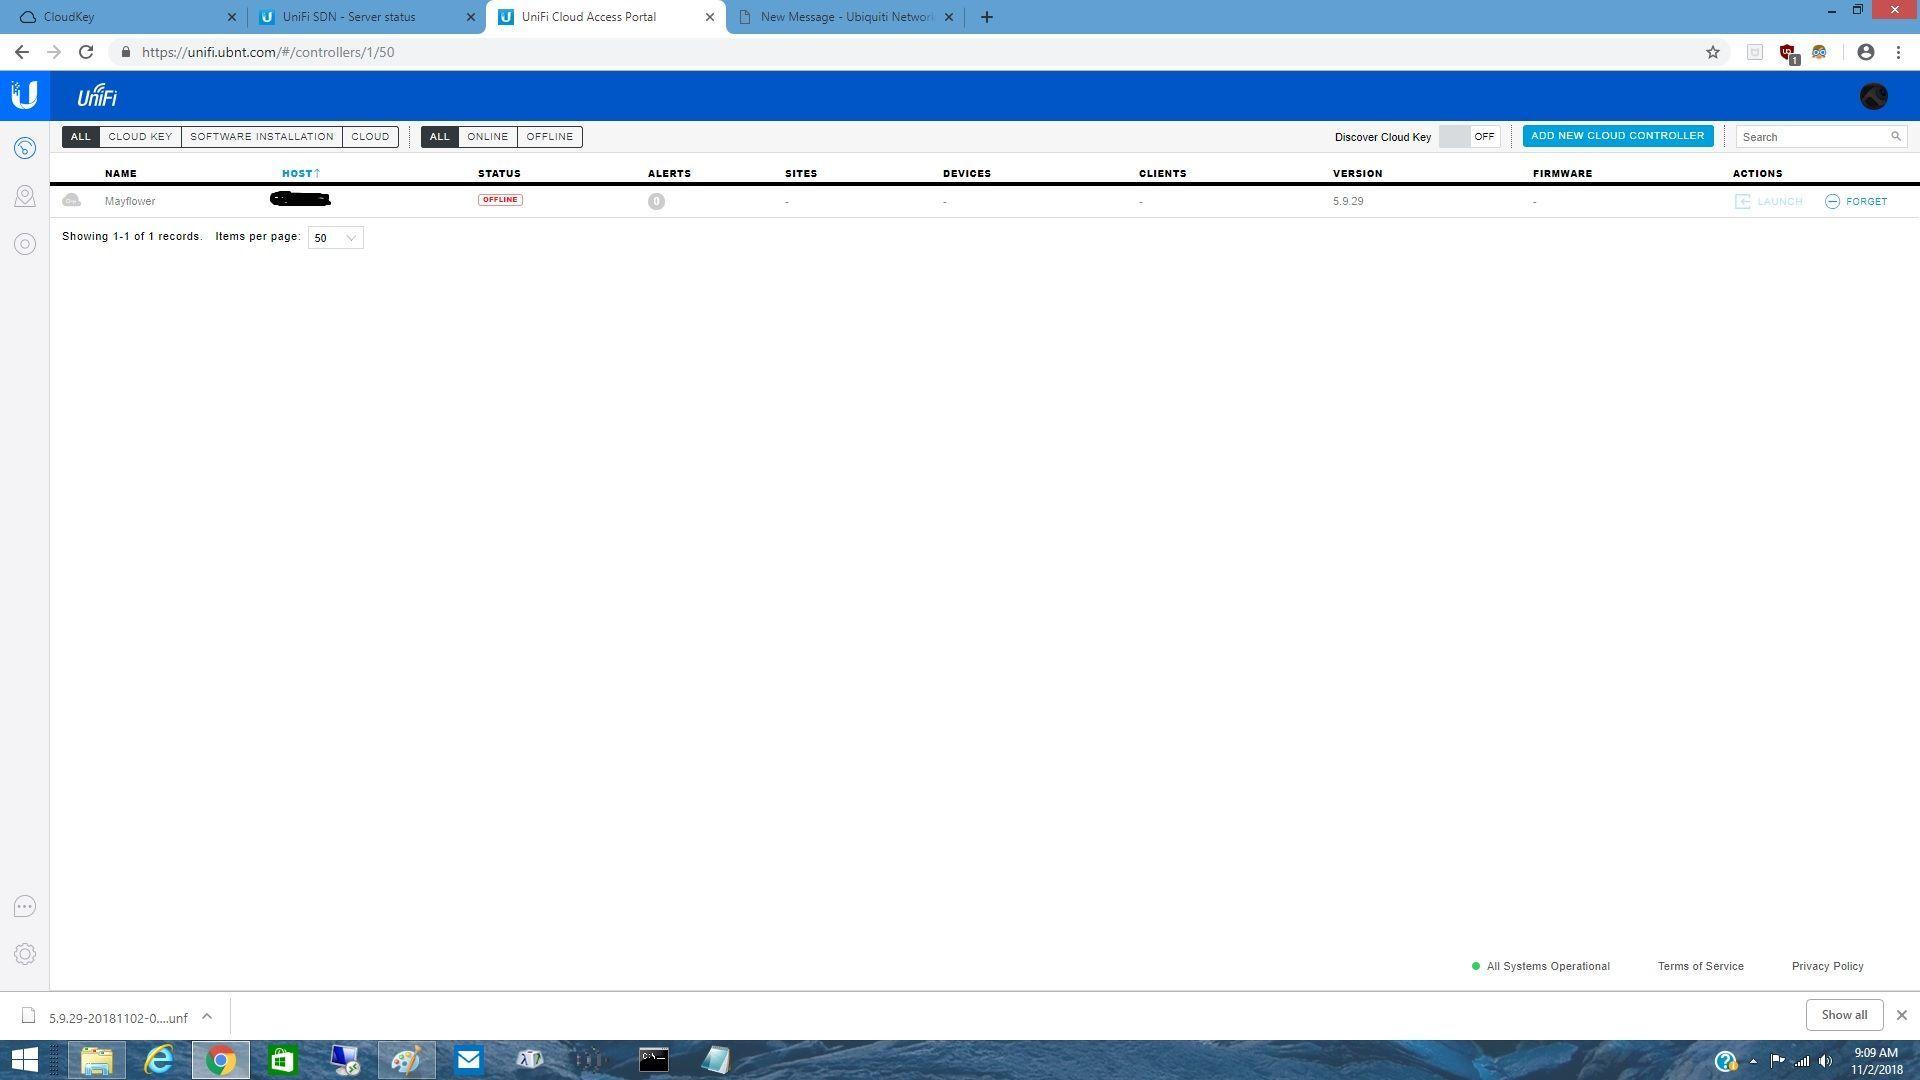 Controller fails to start after reboot of CloudKey | Ubiquiti Community